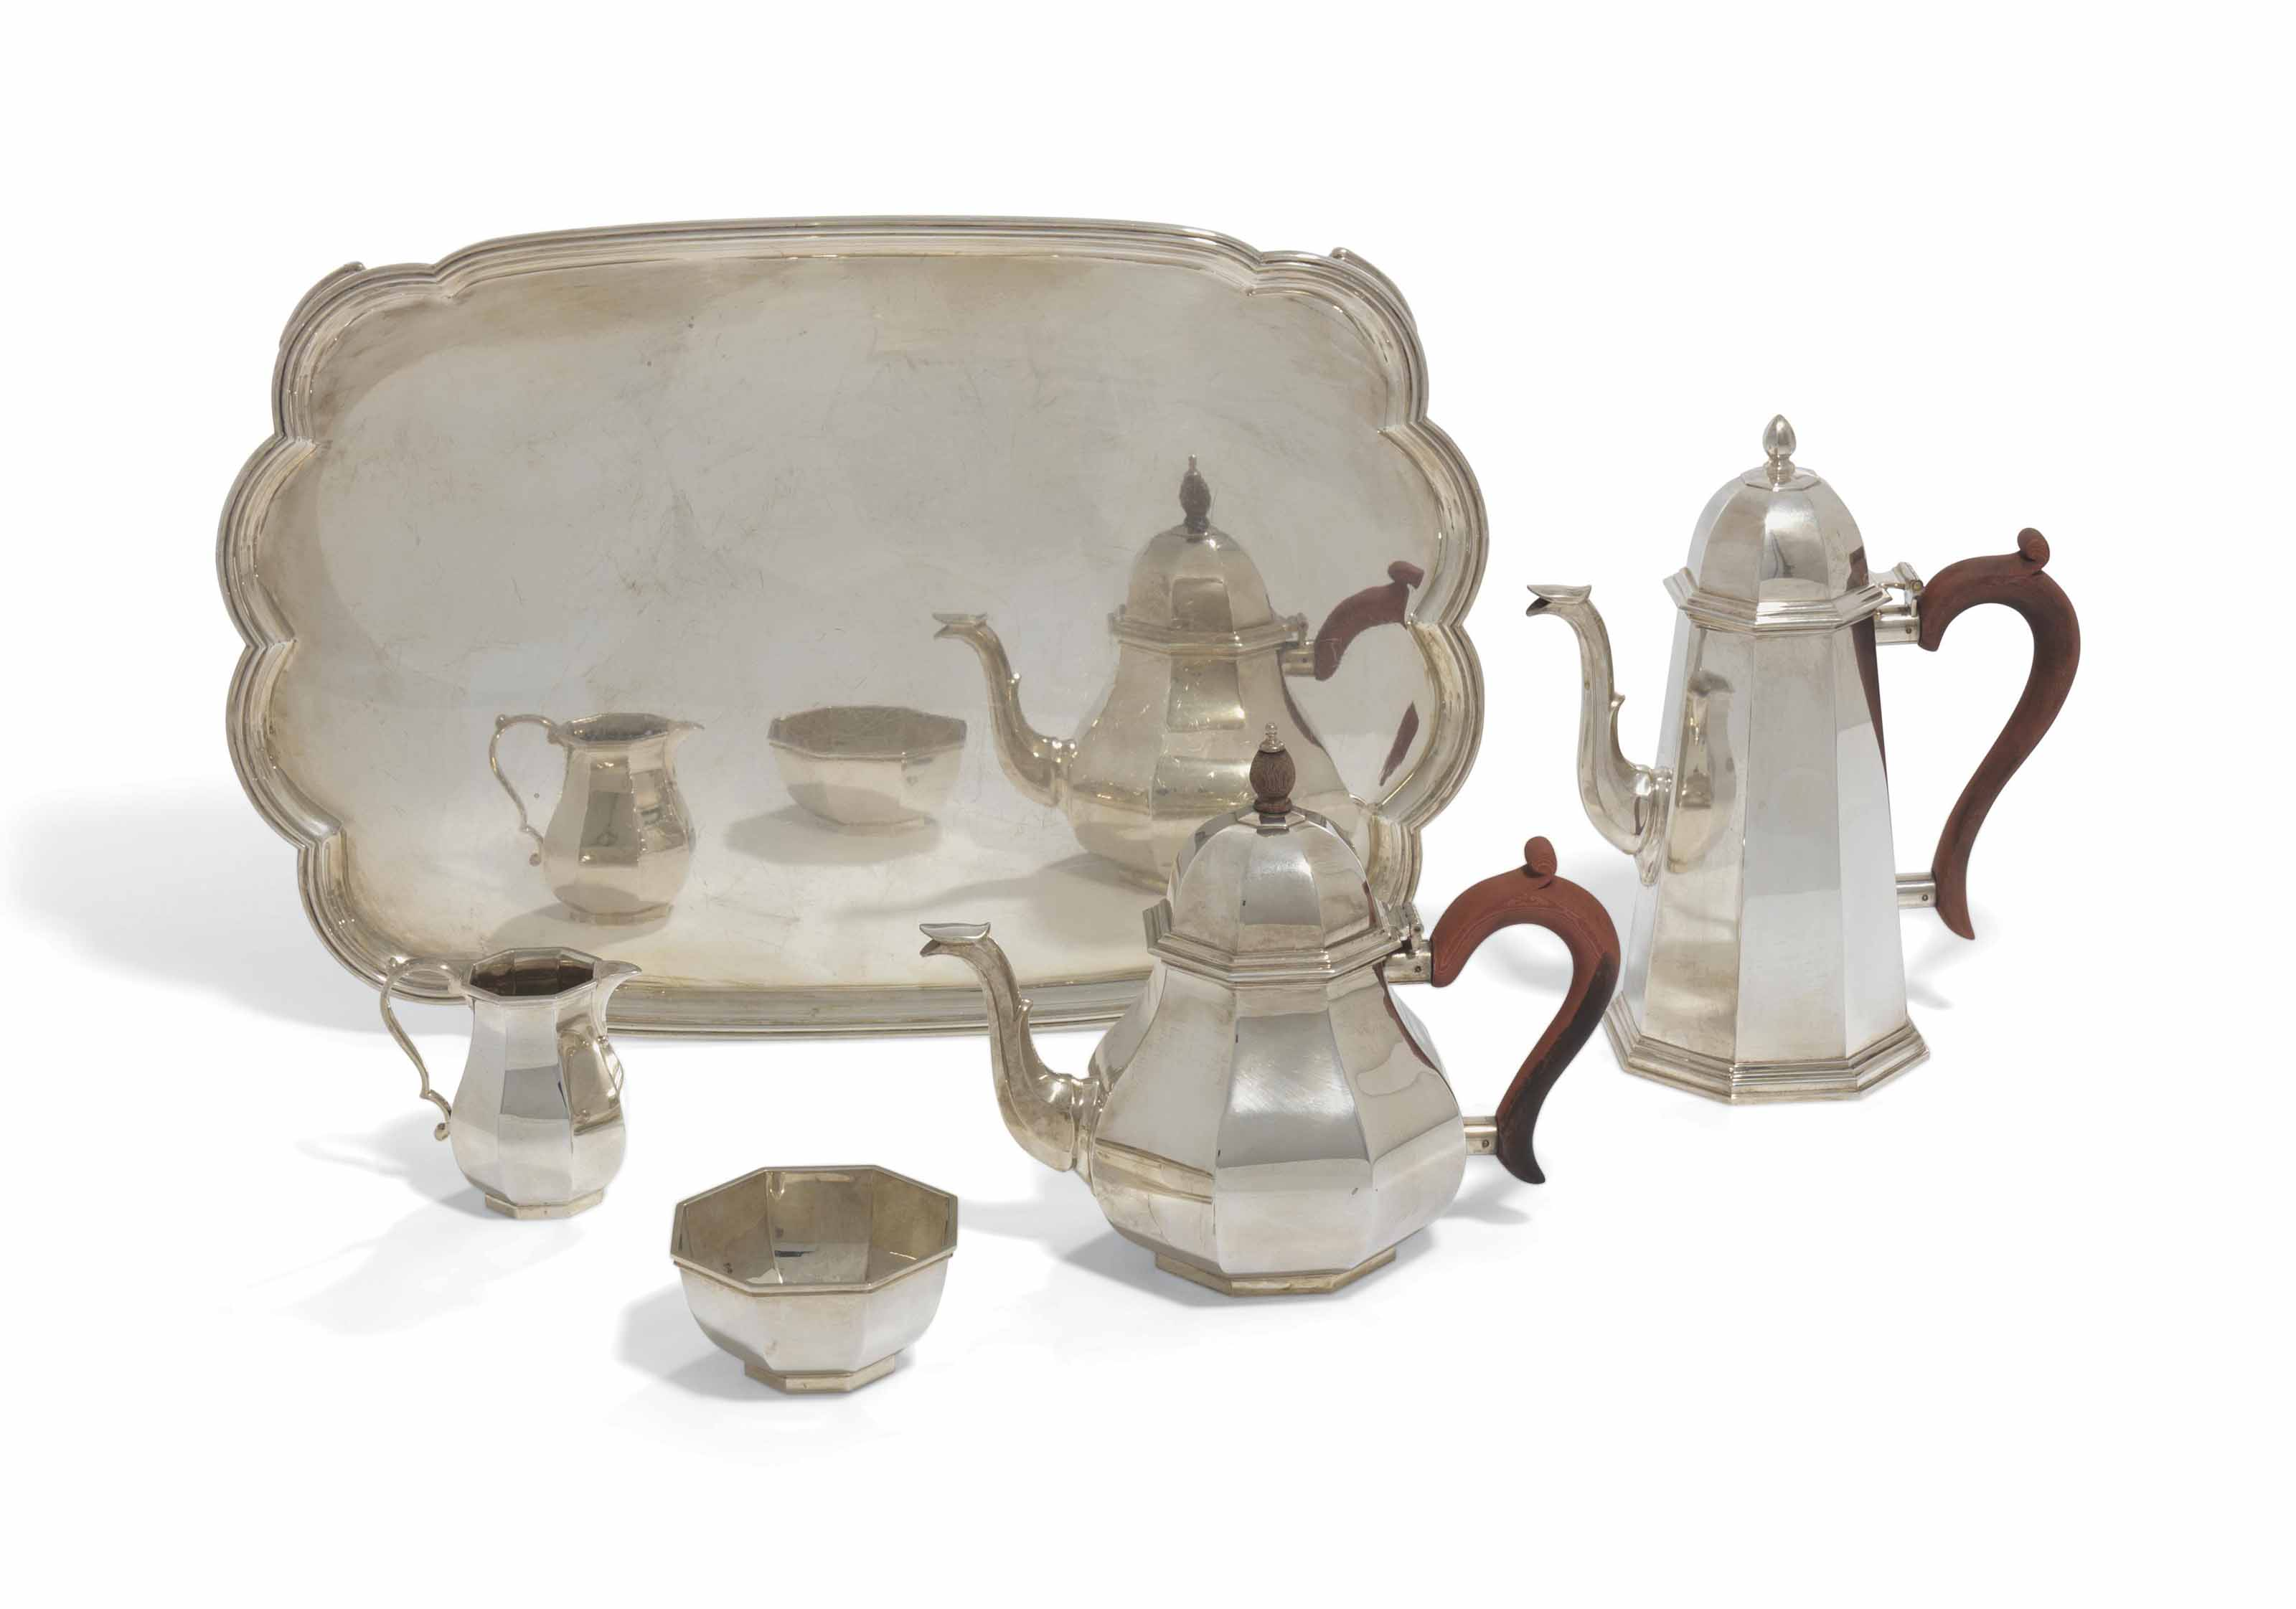 AN ELIZABETH II SILVER TEA AND COFFEE-SERVICE WITH A TRAY EN SUITE